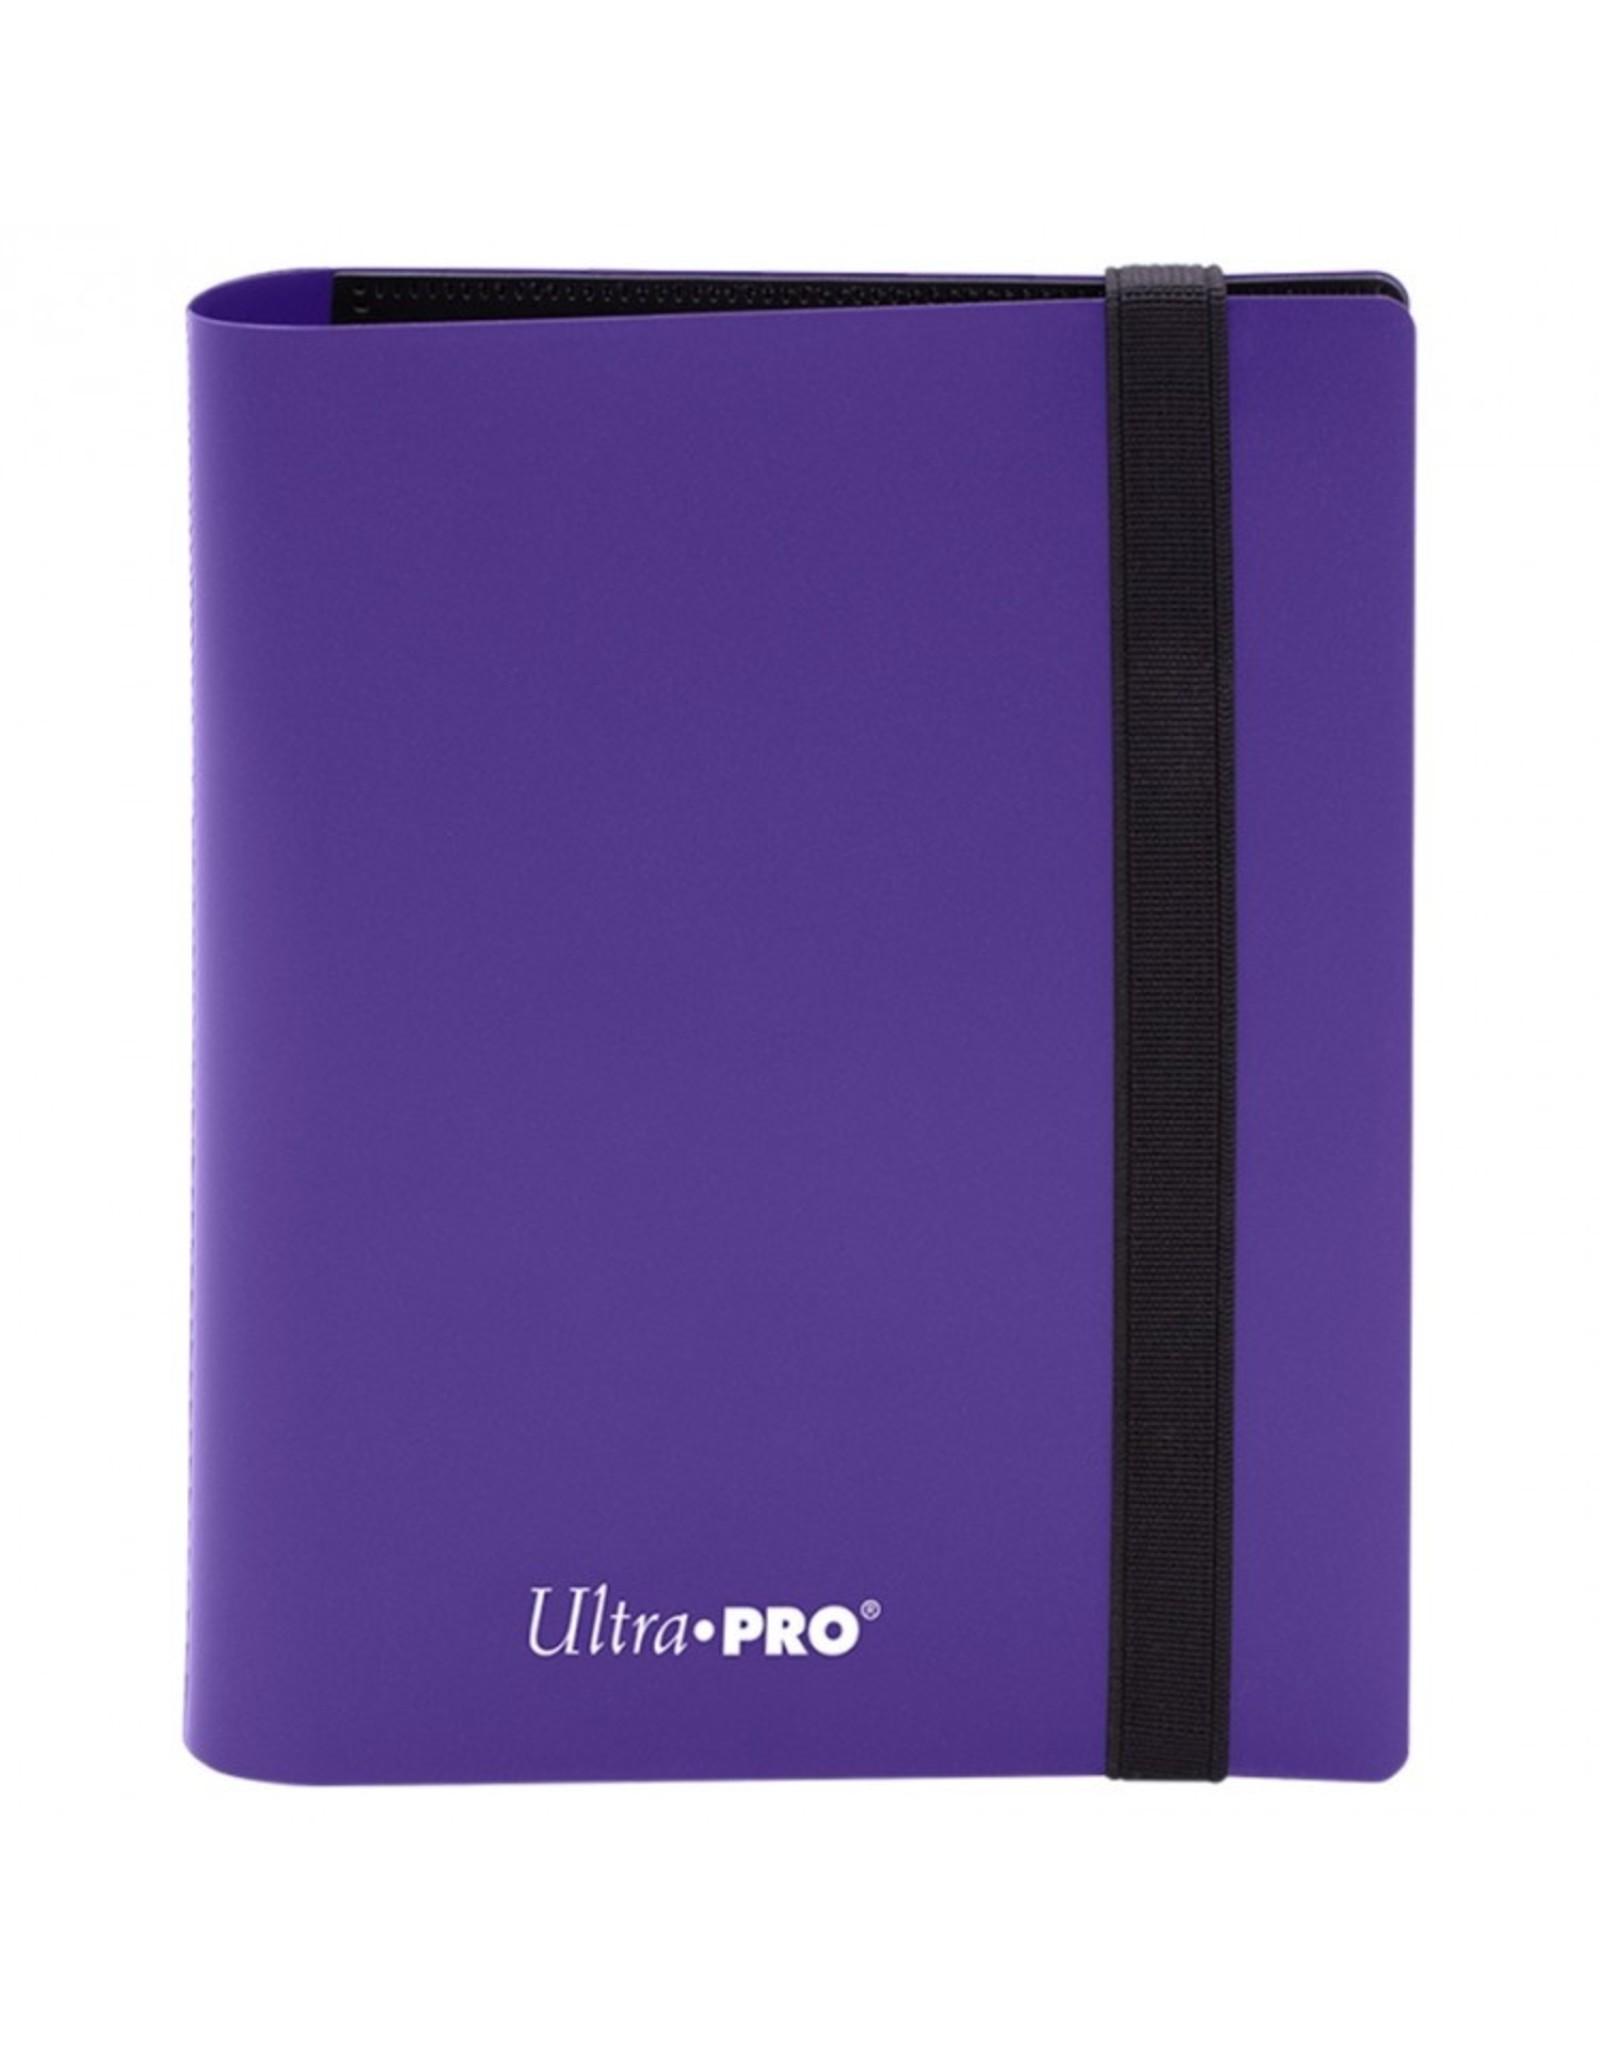 Ultra Pro Binder: 4pkt: PRO: Eclipse: Royal PU